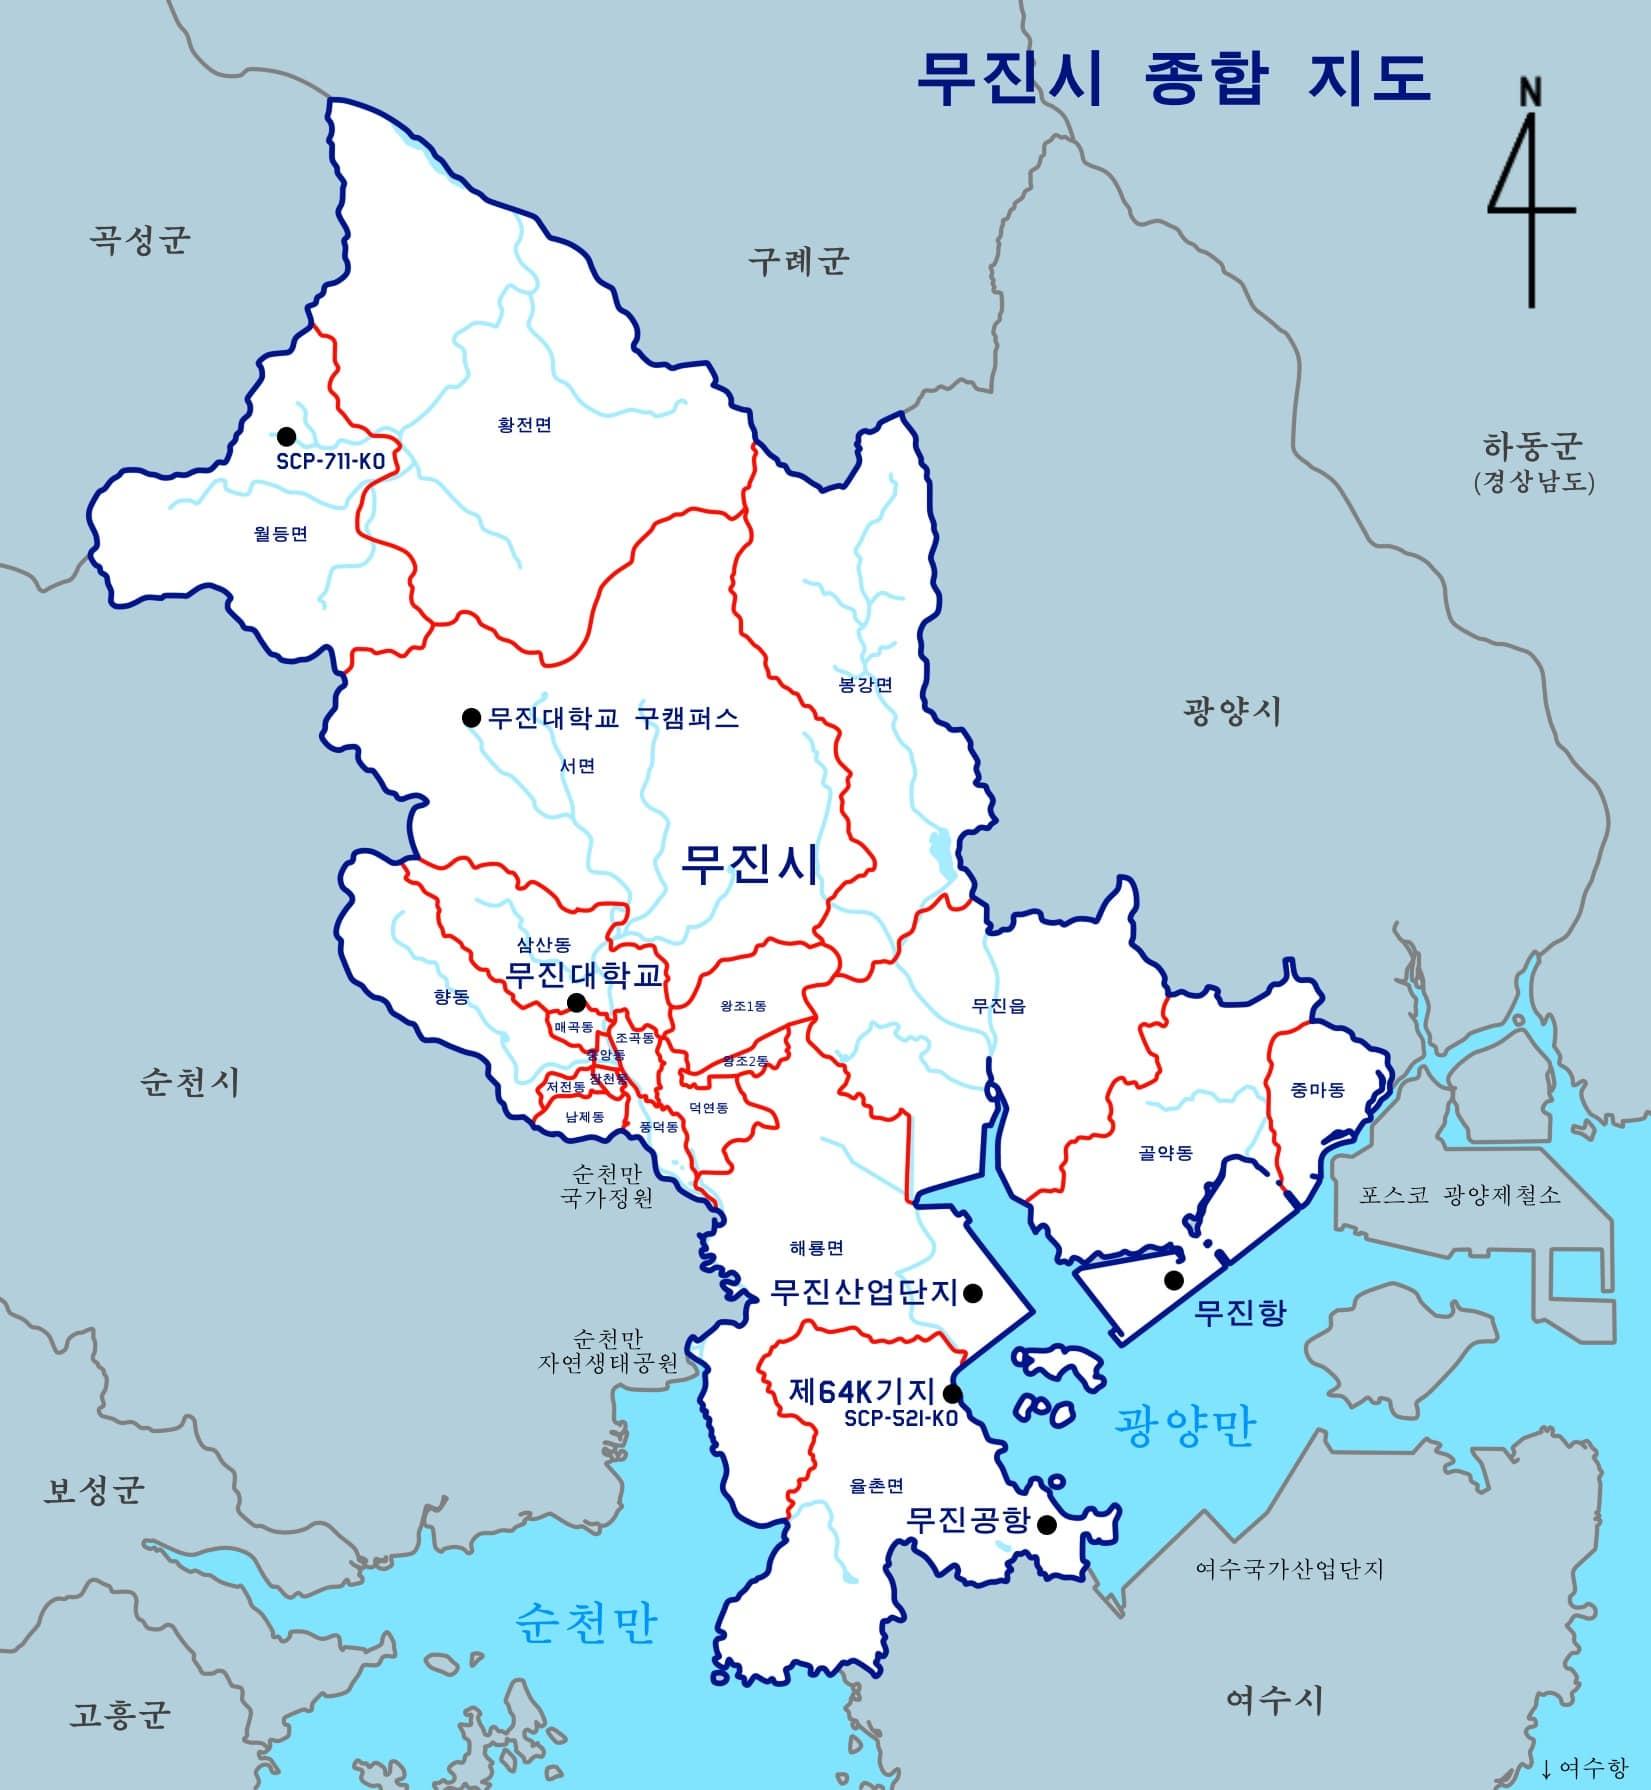 mujin-map-complete.jpg